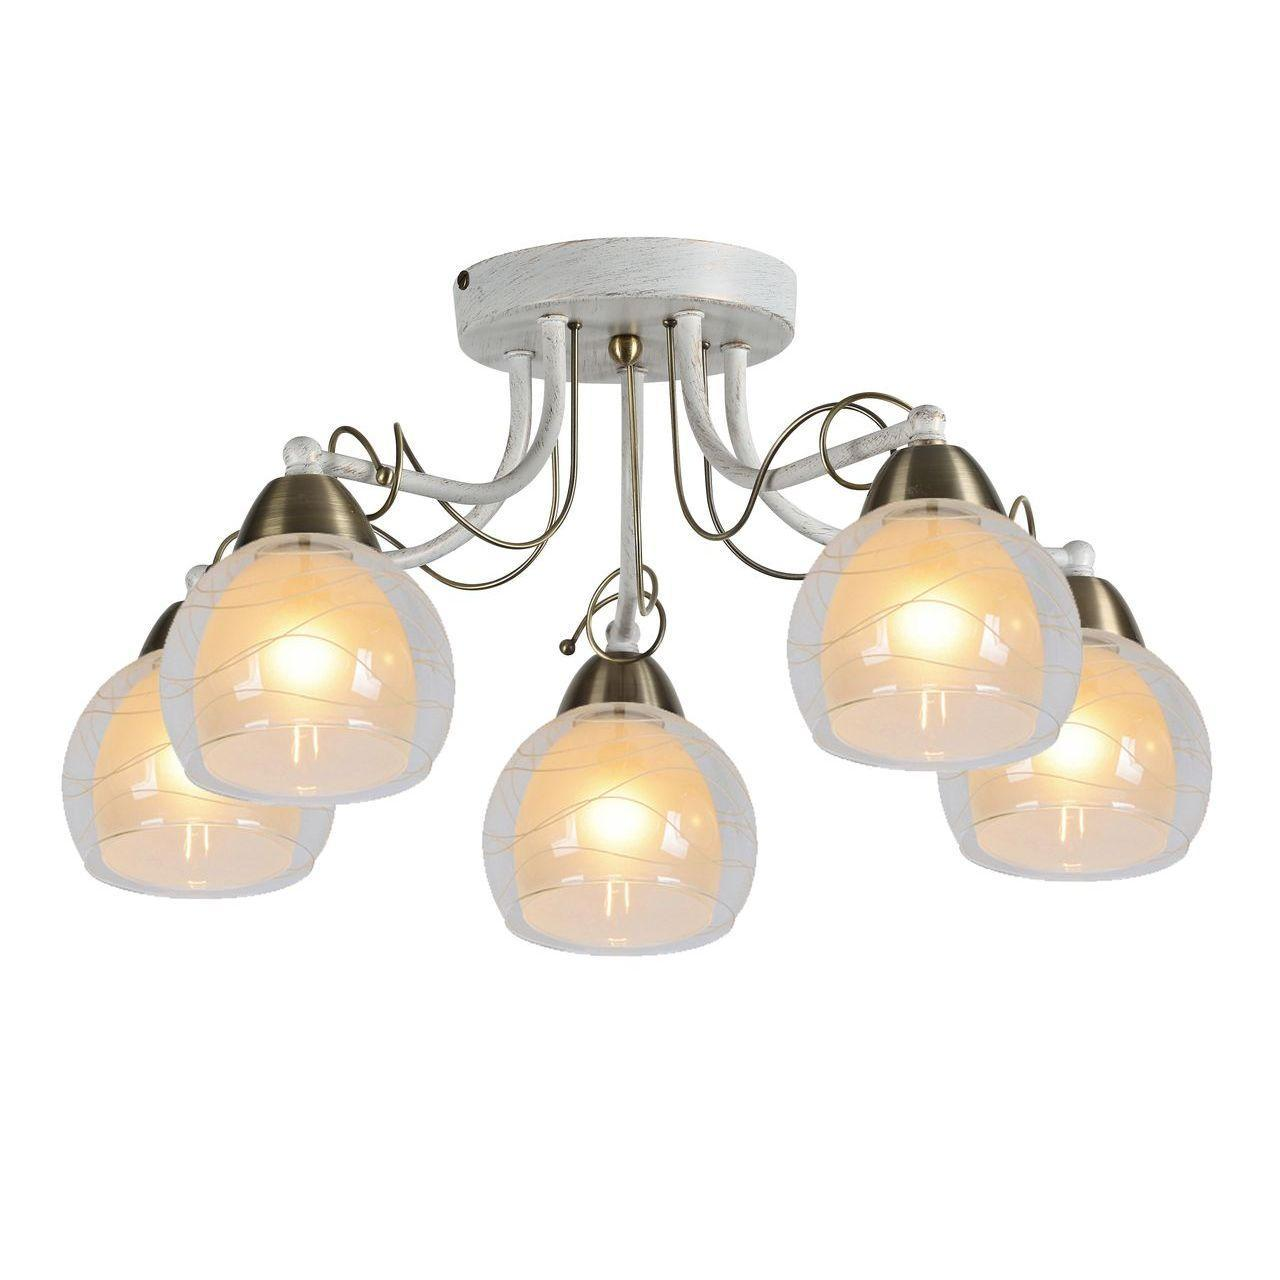 Люстра Arte Lamp Intreccio A1633PL-5WG потолочная потолочная люстра arte lamp intreccio a1633pl 5wg